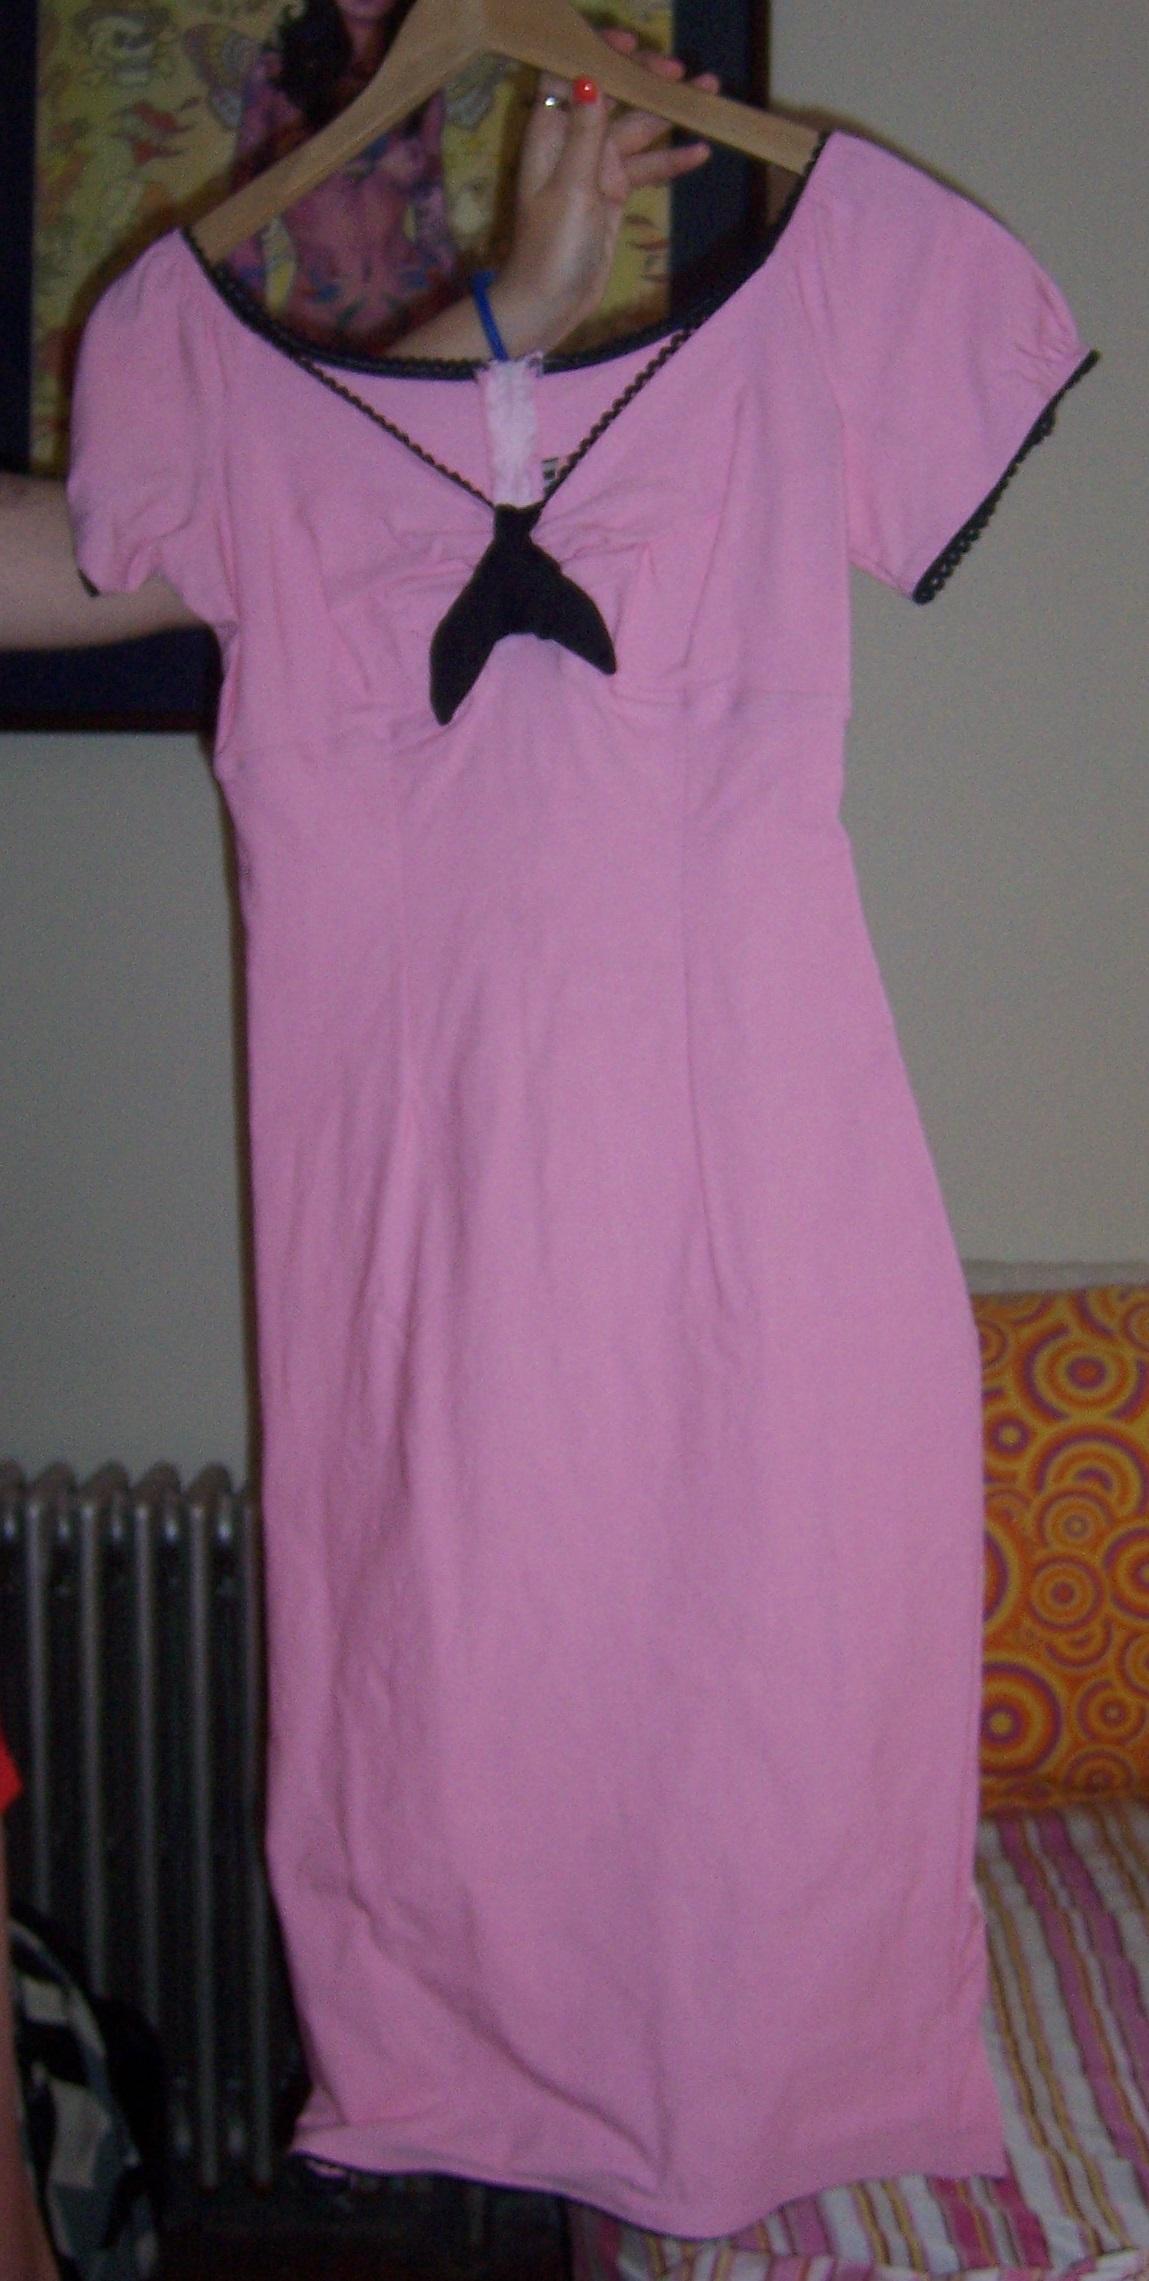 Leah's favorite dress Pinup Girl pink